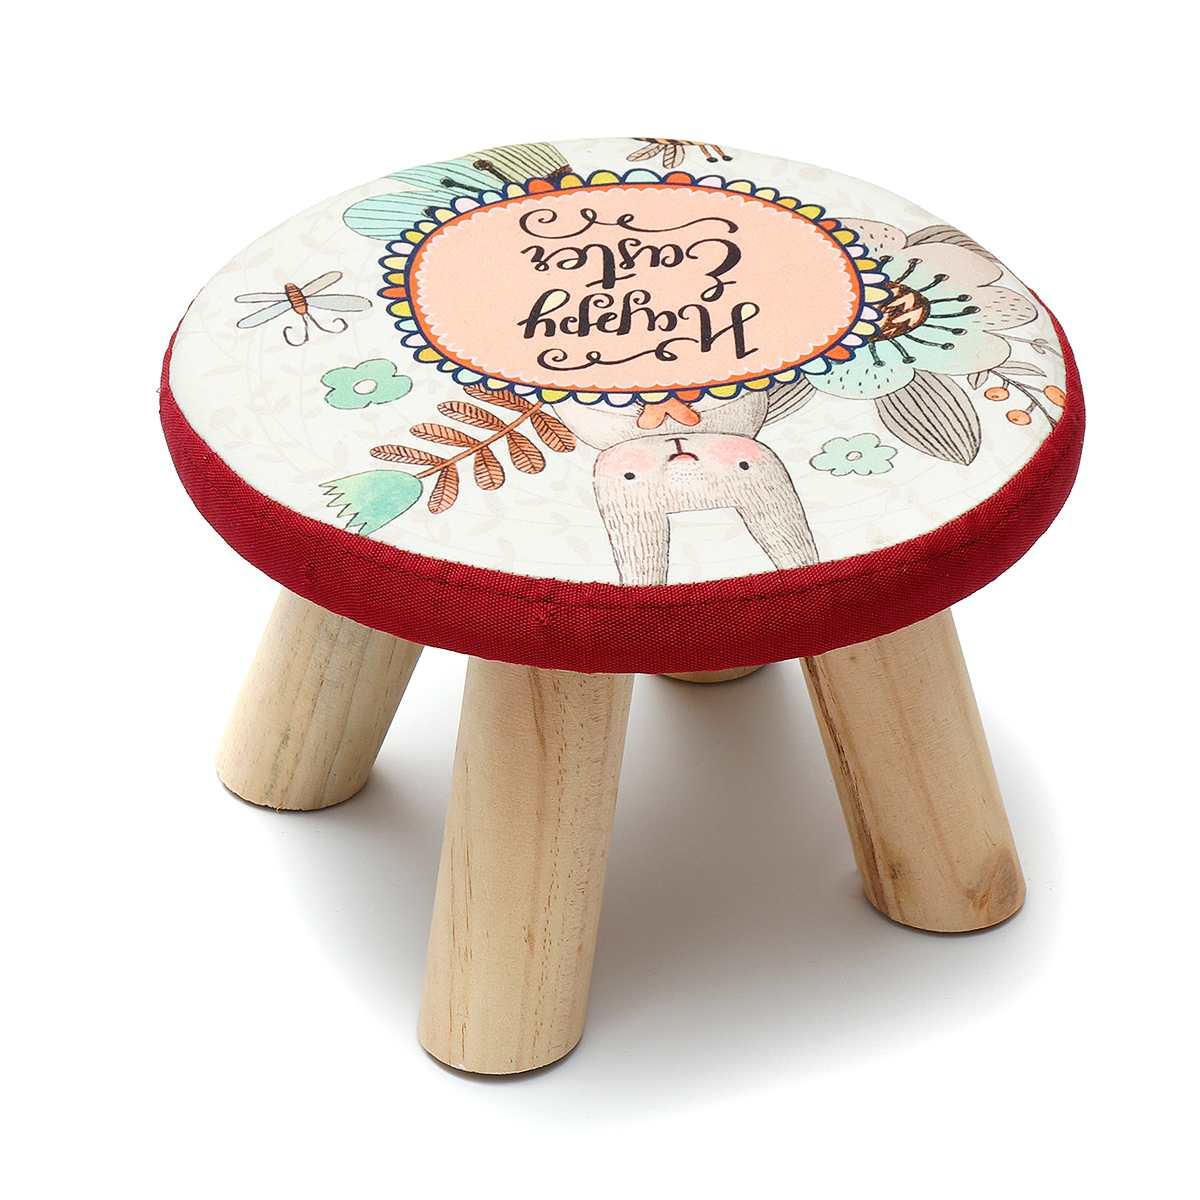 Fashion Home Sofa Round Stool Cloth Art Living Room Tea Table Mound Wooden Creative Small Foot Stools Saddle Kids Stool Bench